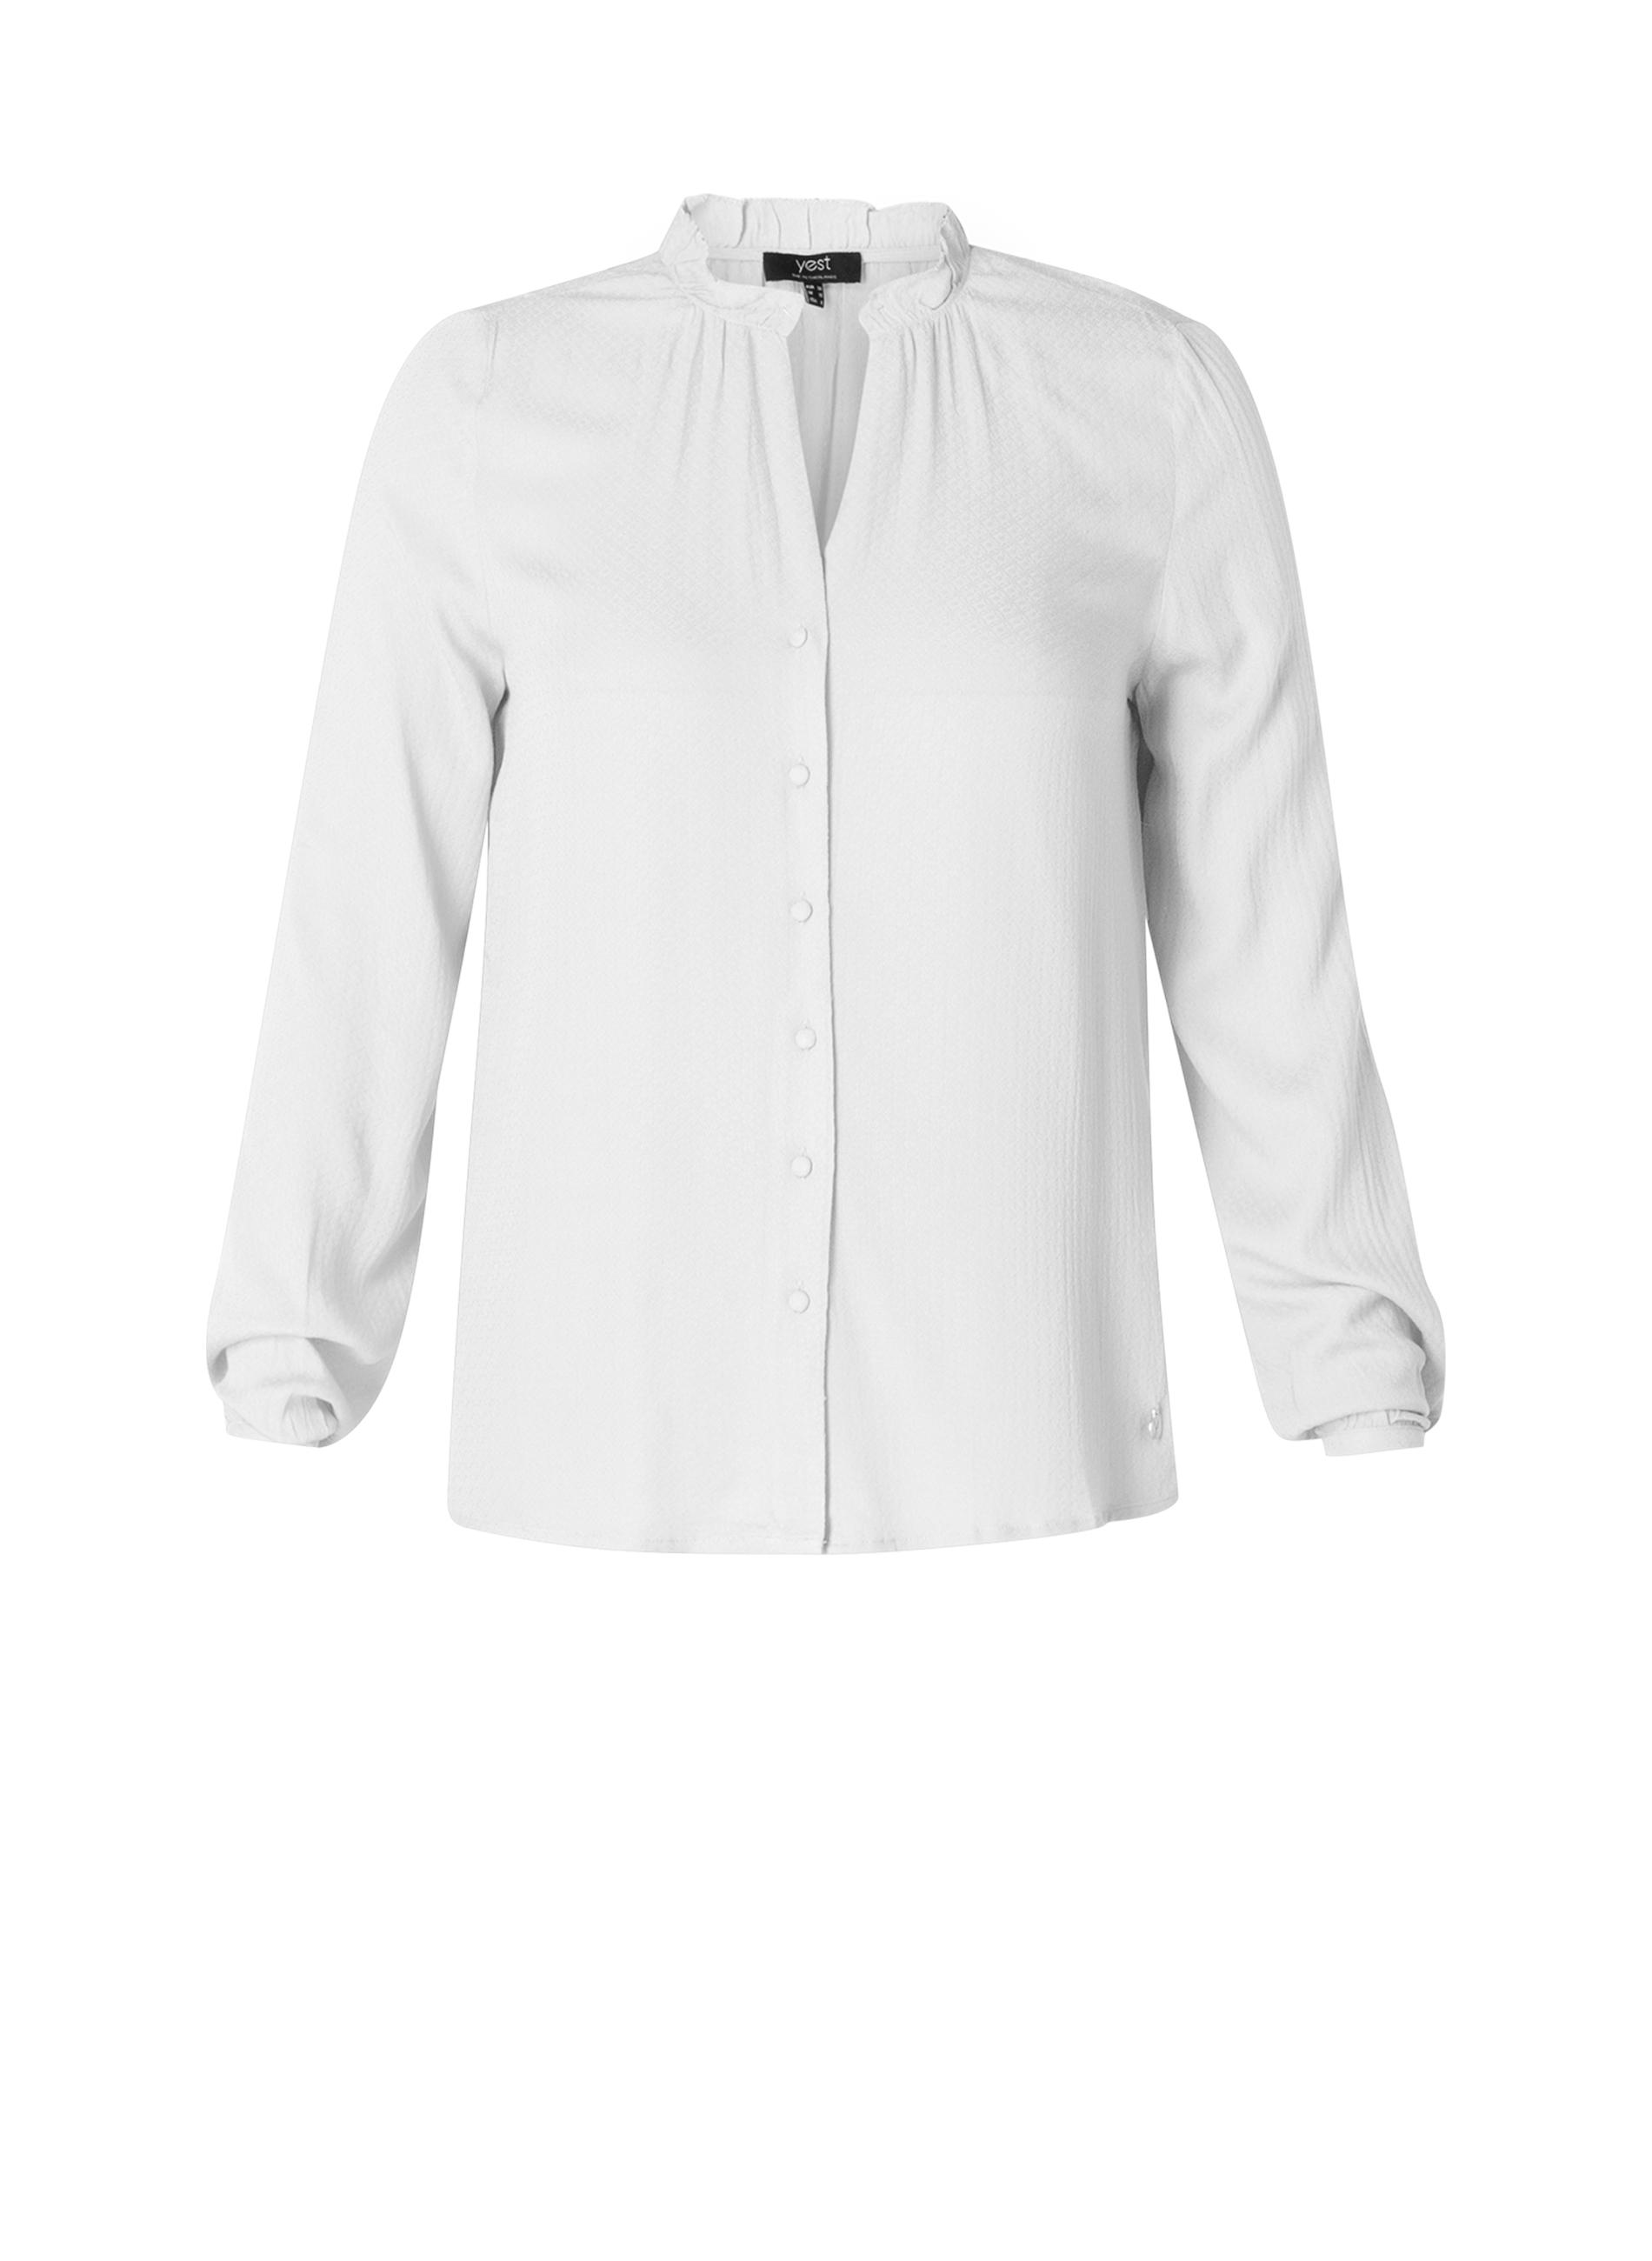 Yest blouse Indira 65 cm